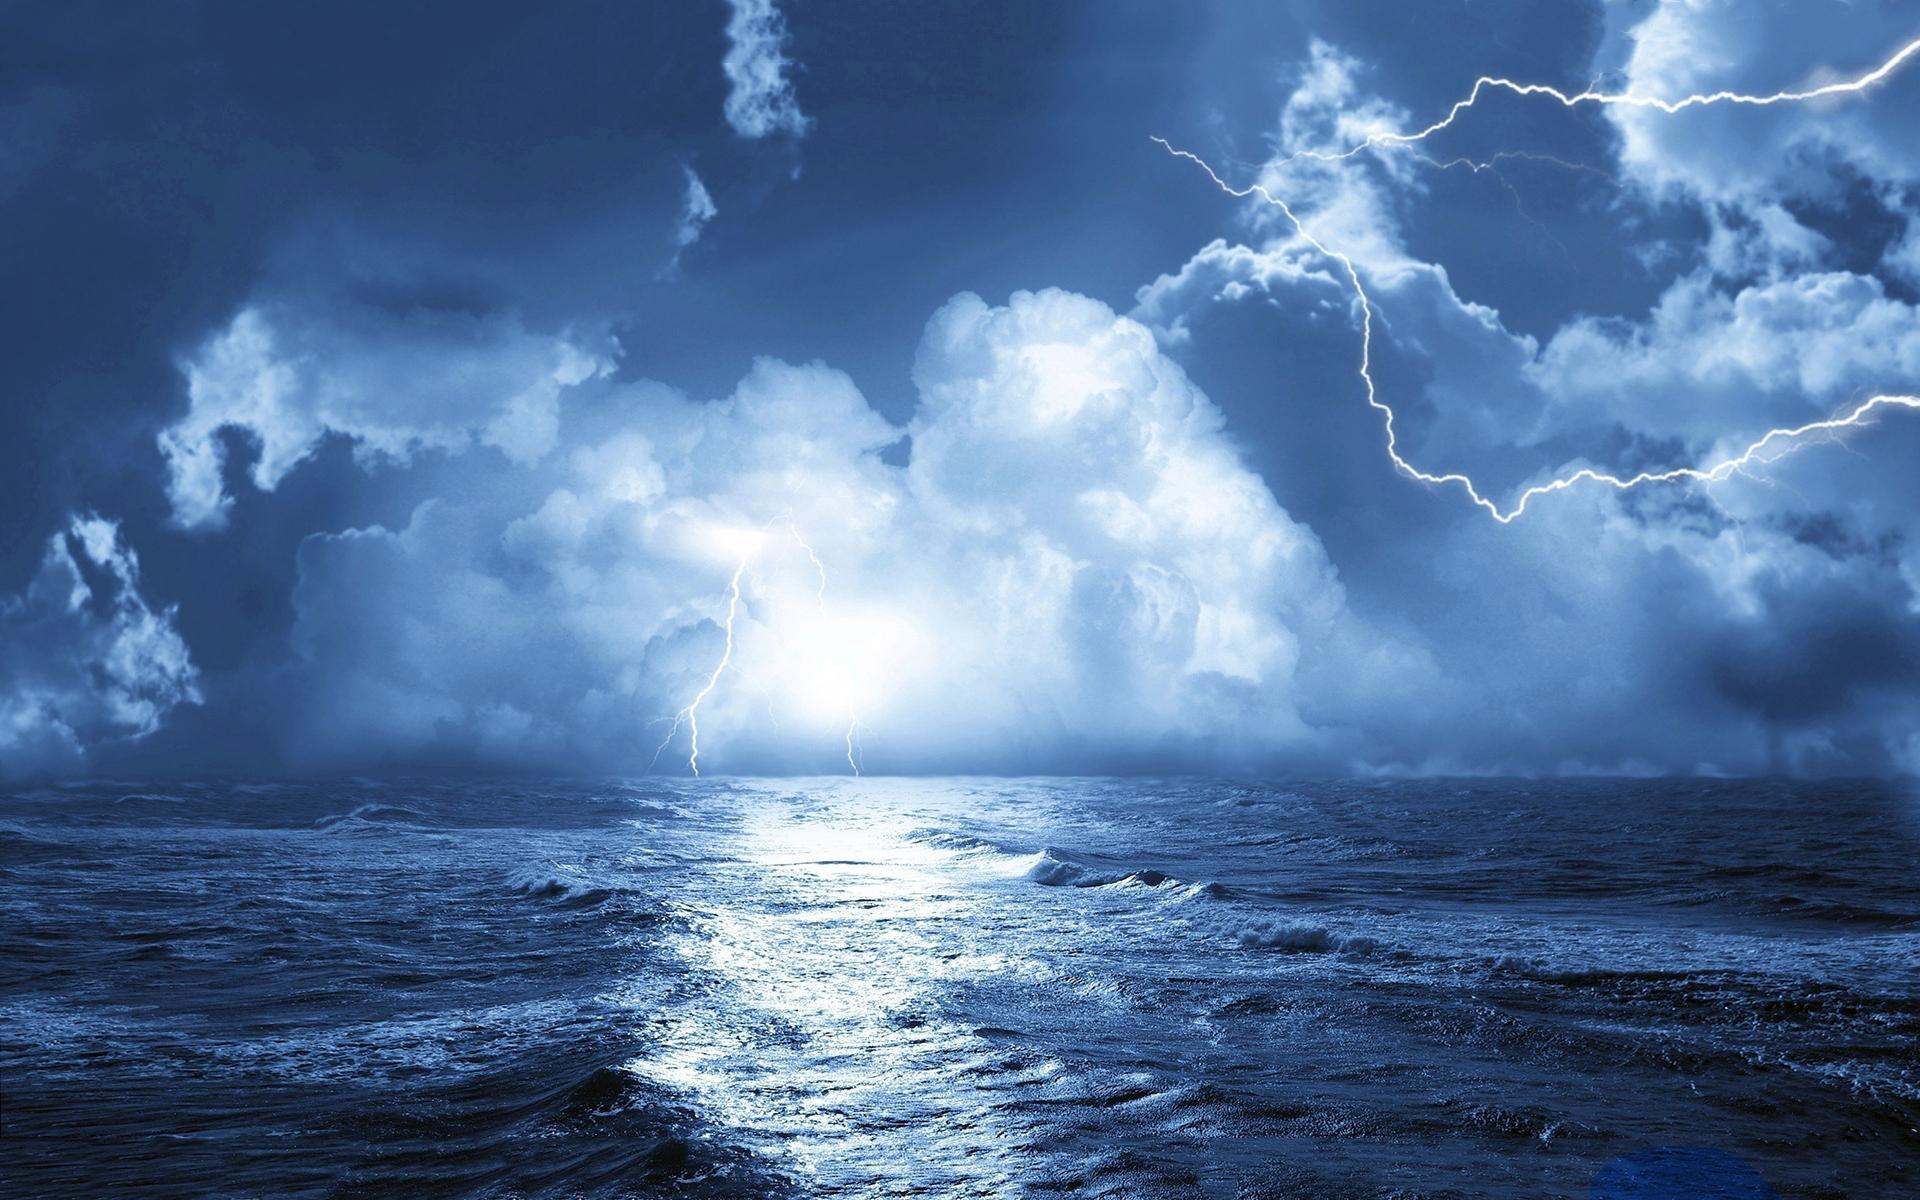 Storm over sea